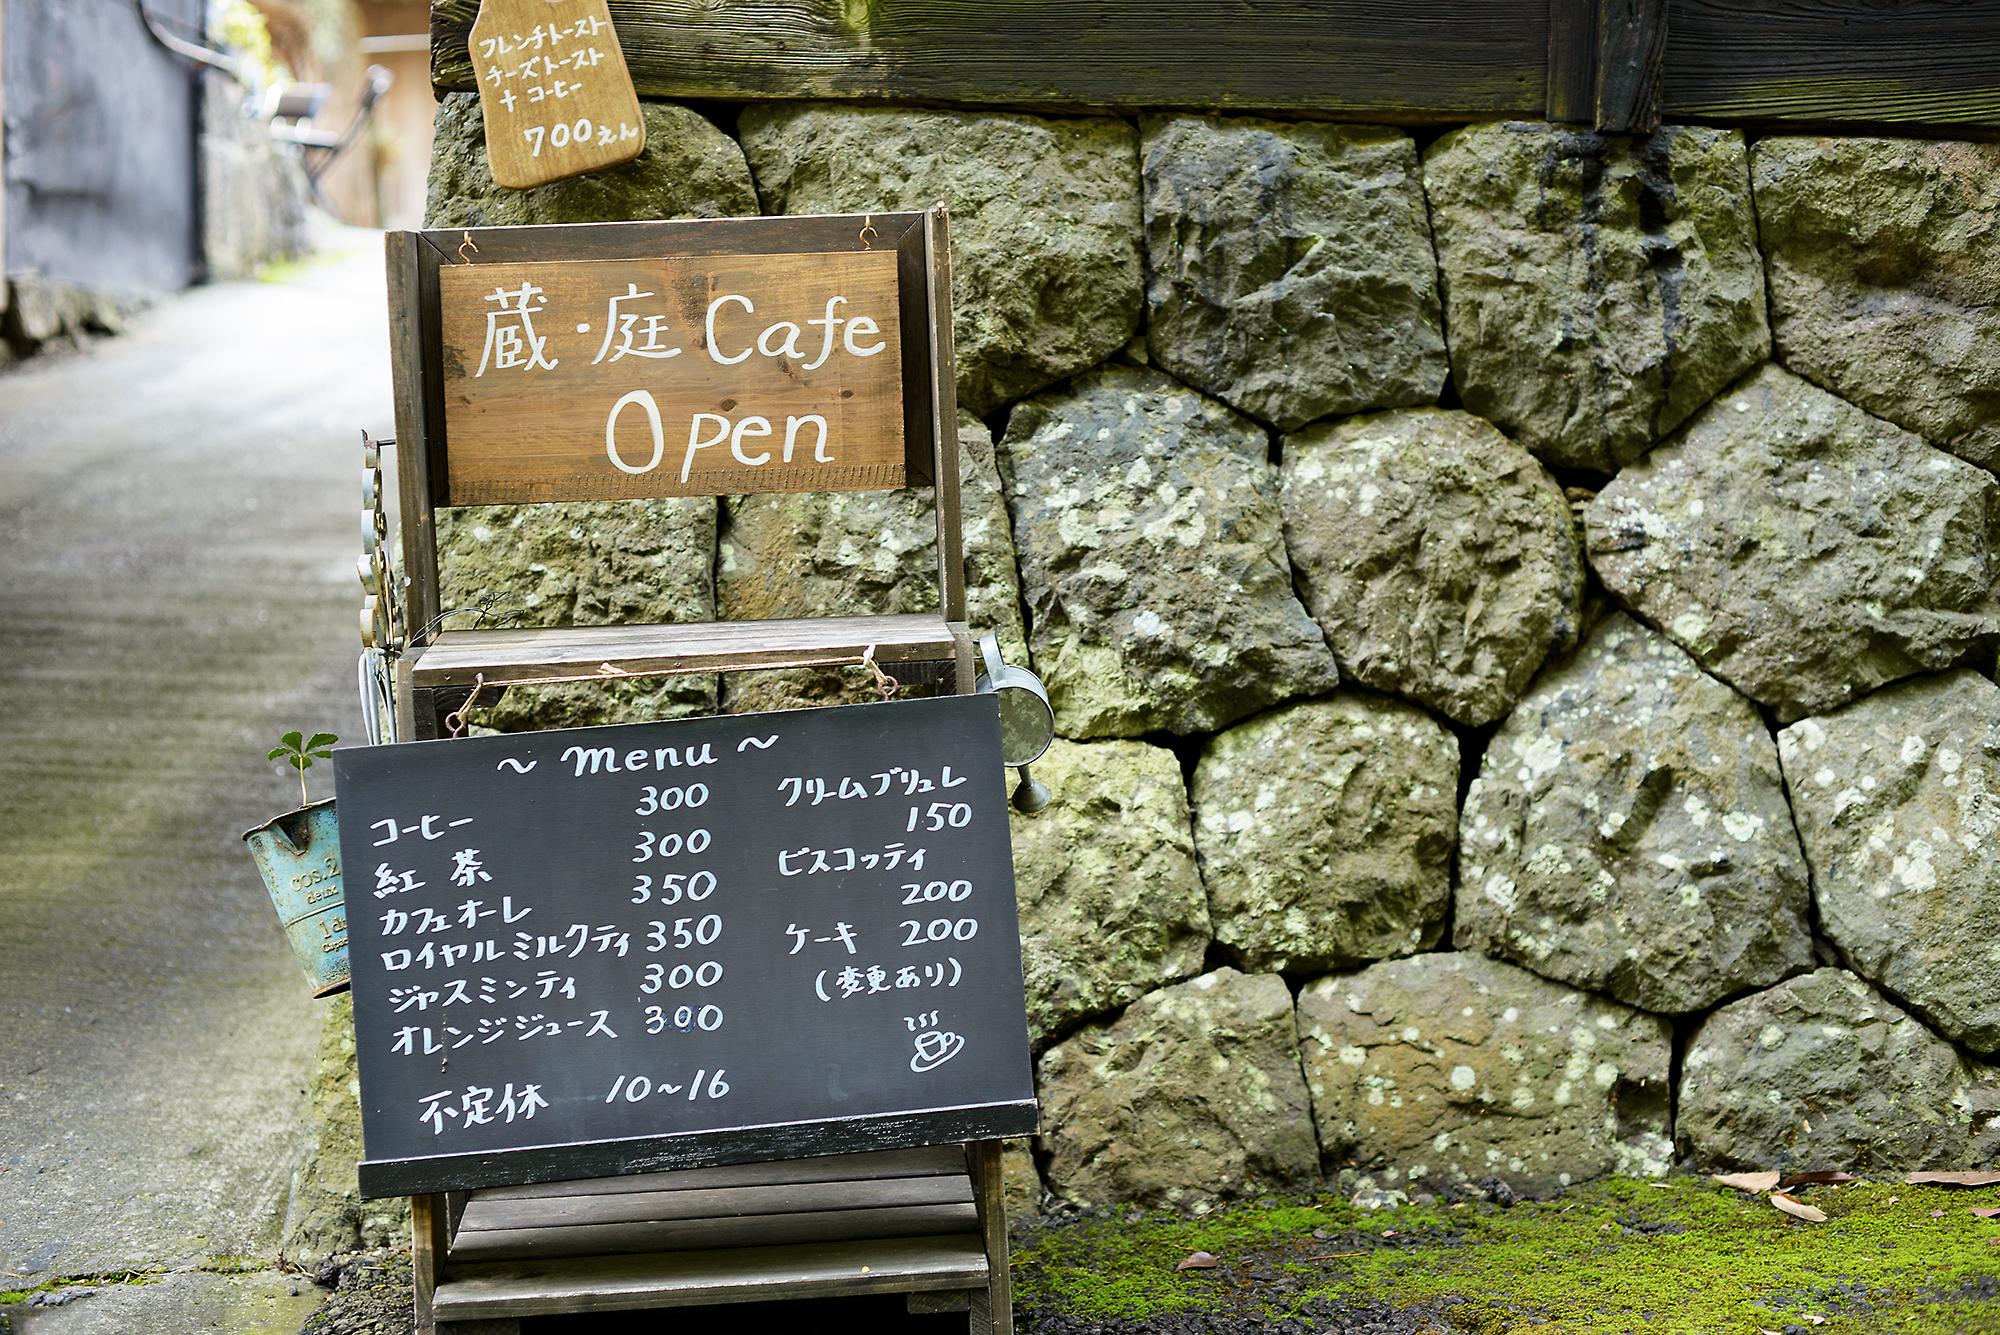 蔵・庭cafe